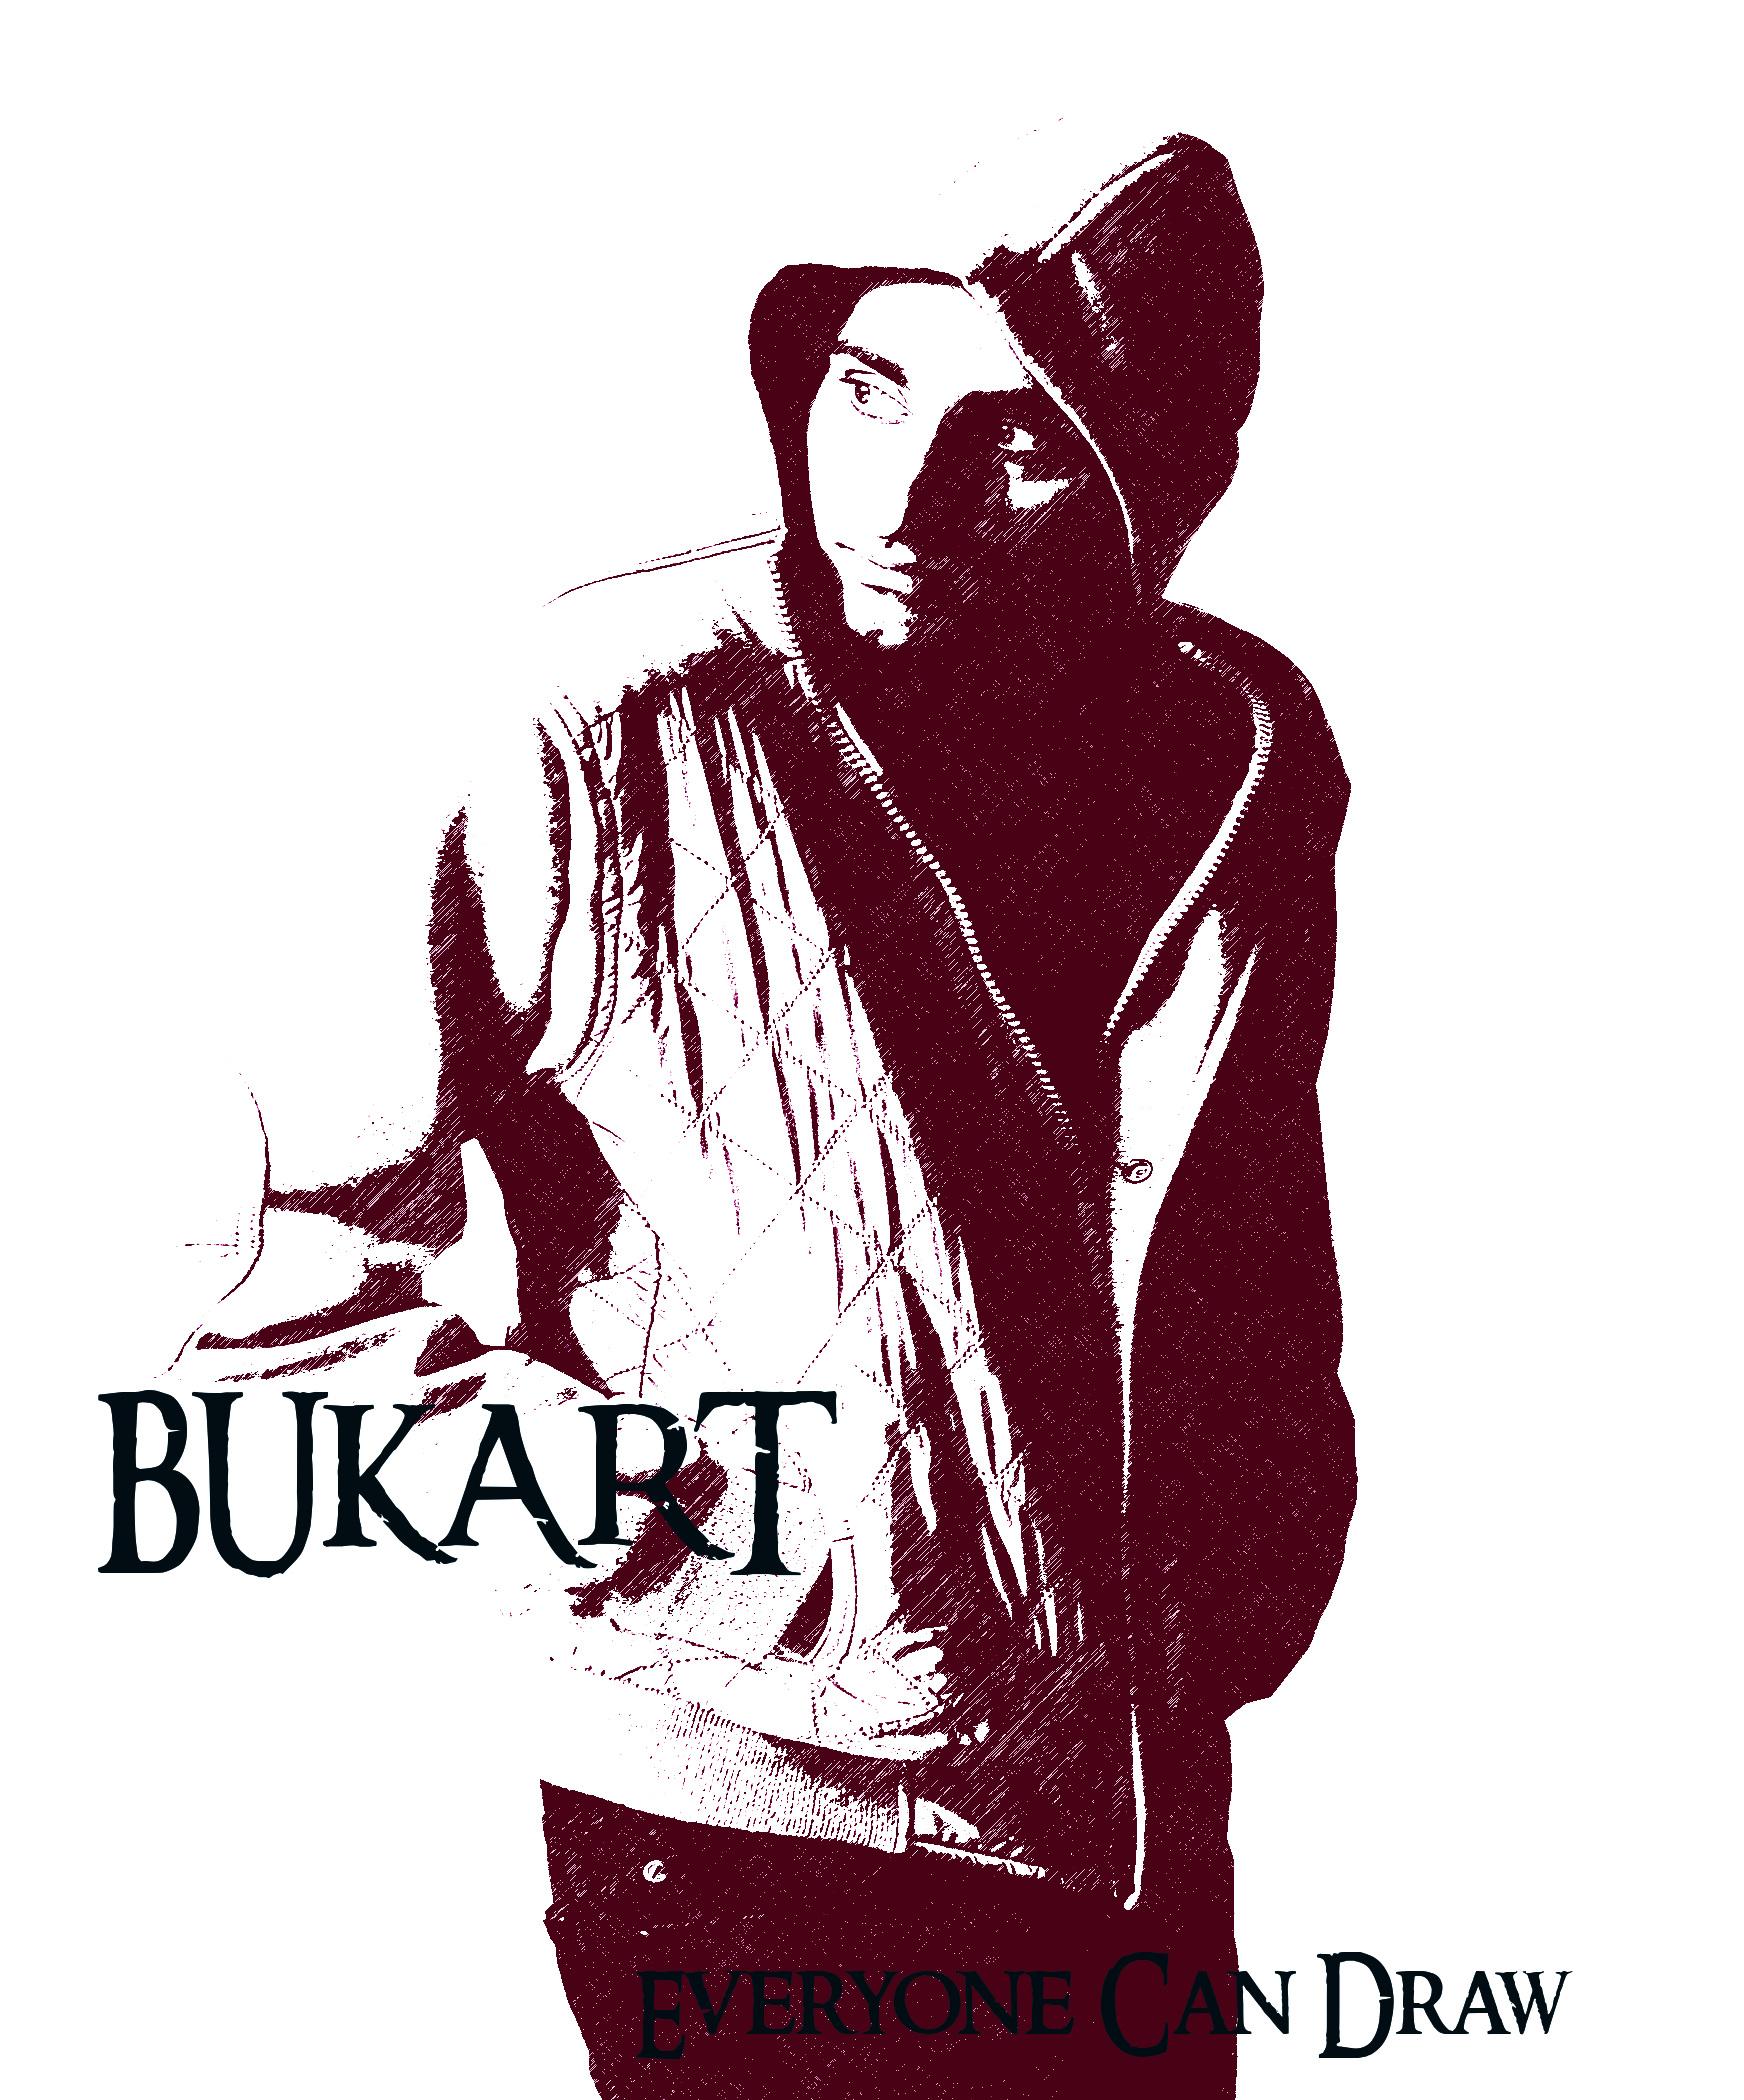 Bukart   everyone can draw bba95e7173